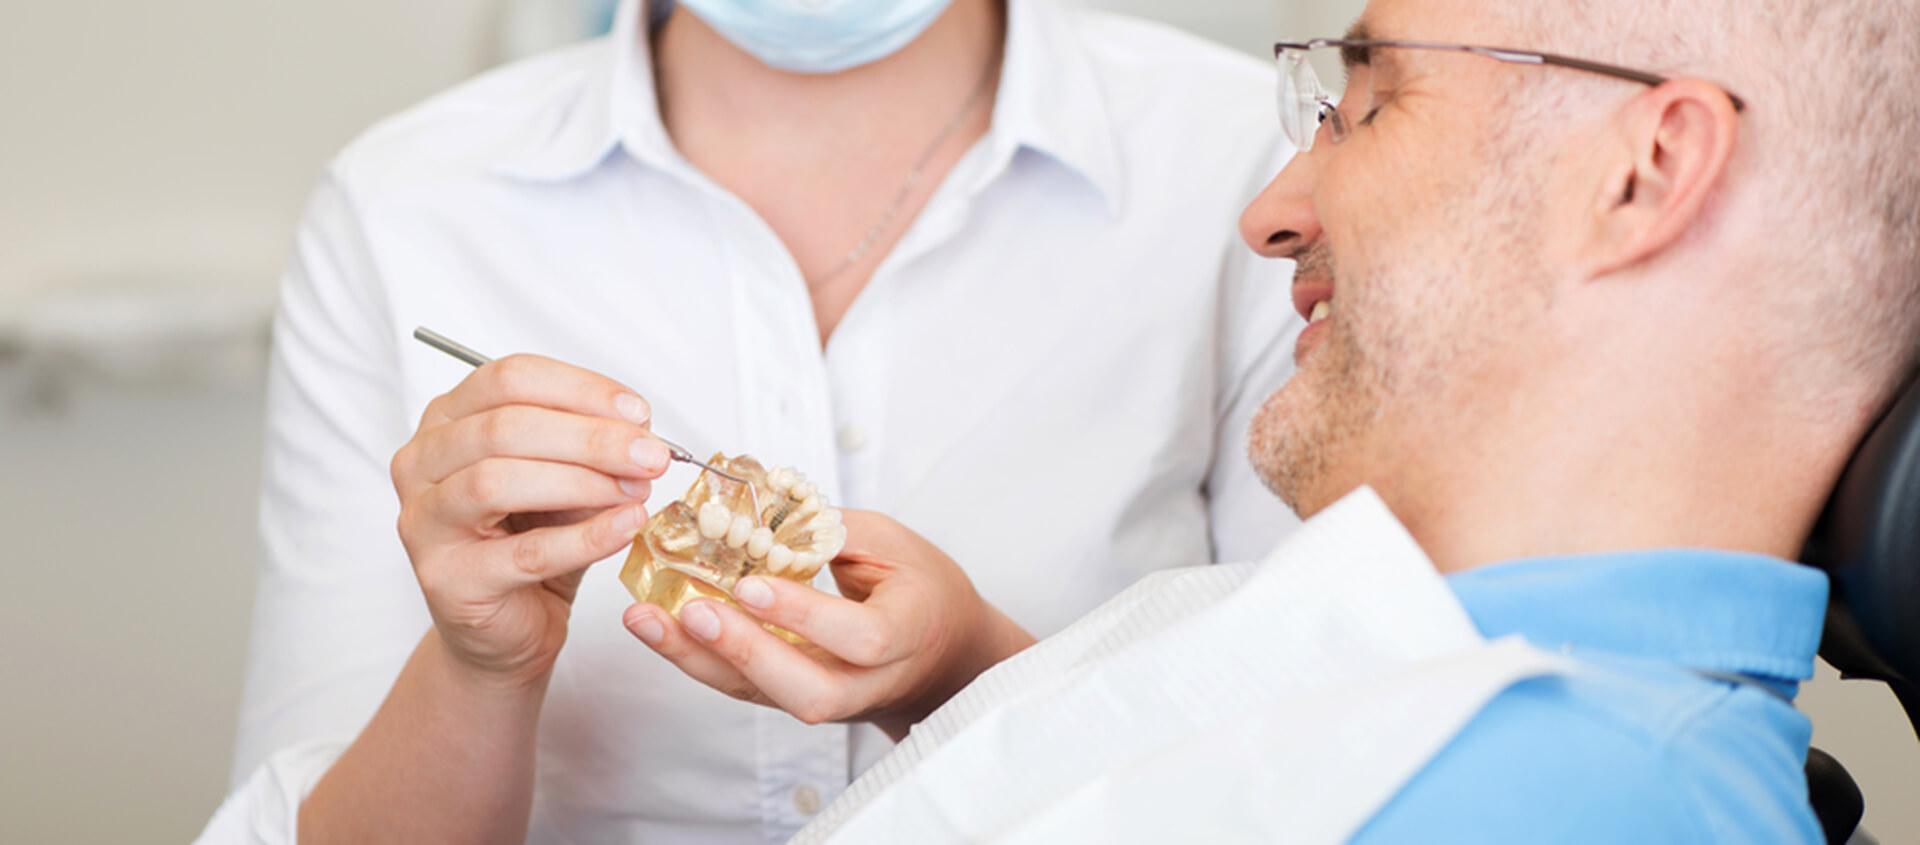 Removable Partial Dentures Are Restoring Smiles in Brandon, FL